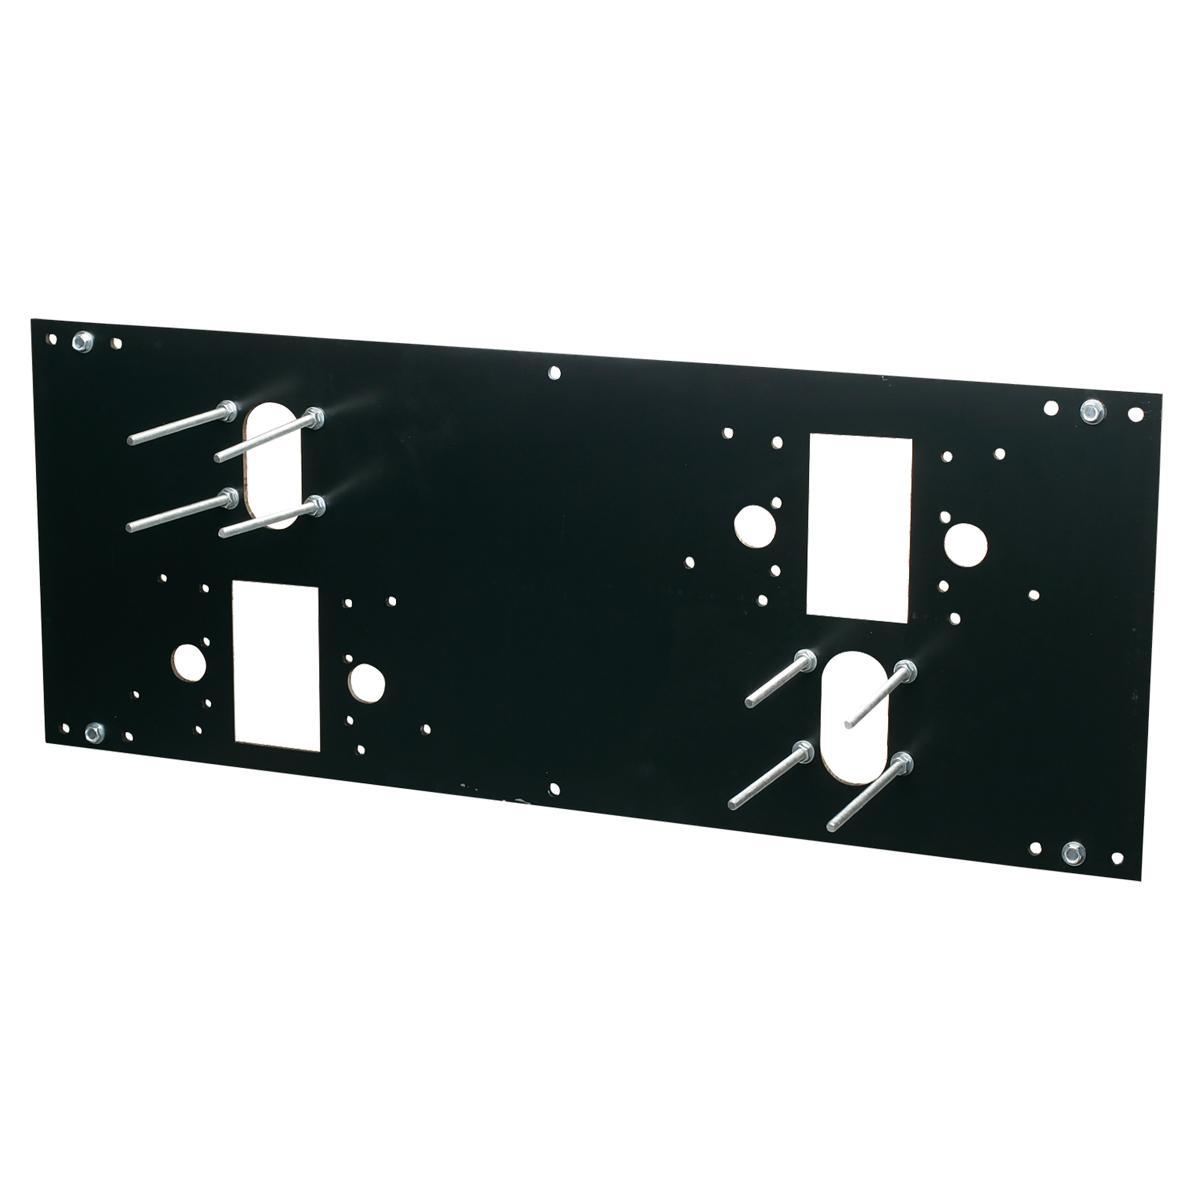 Elkay  Accessory - In Wall Carrier (bi-level) For Edfp217, Edfpb117 & Ehw217 Models 1339439